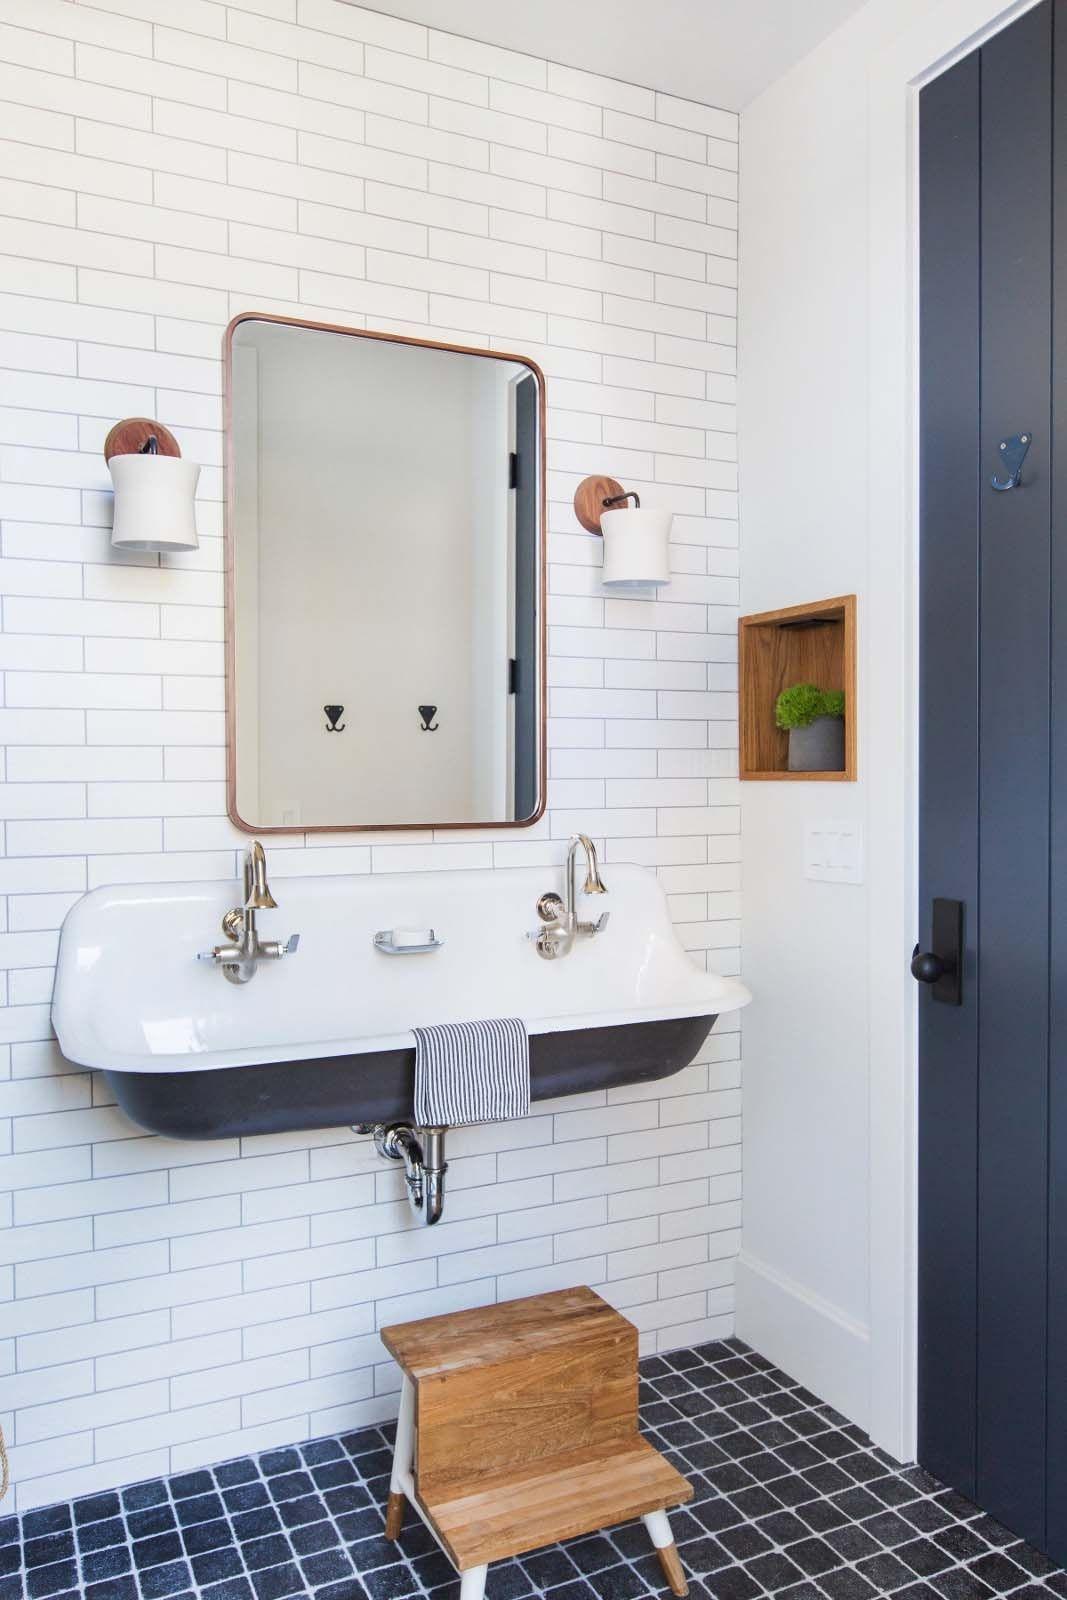 Awesome Bathroom Decor Ideas With Coastal Style 12